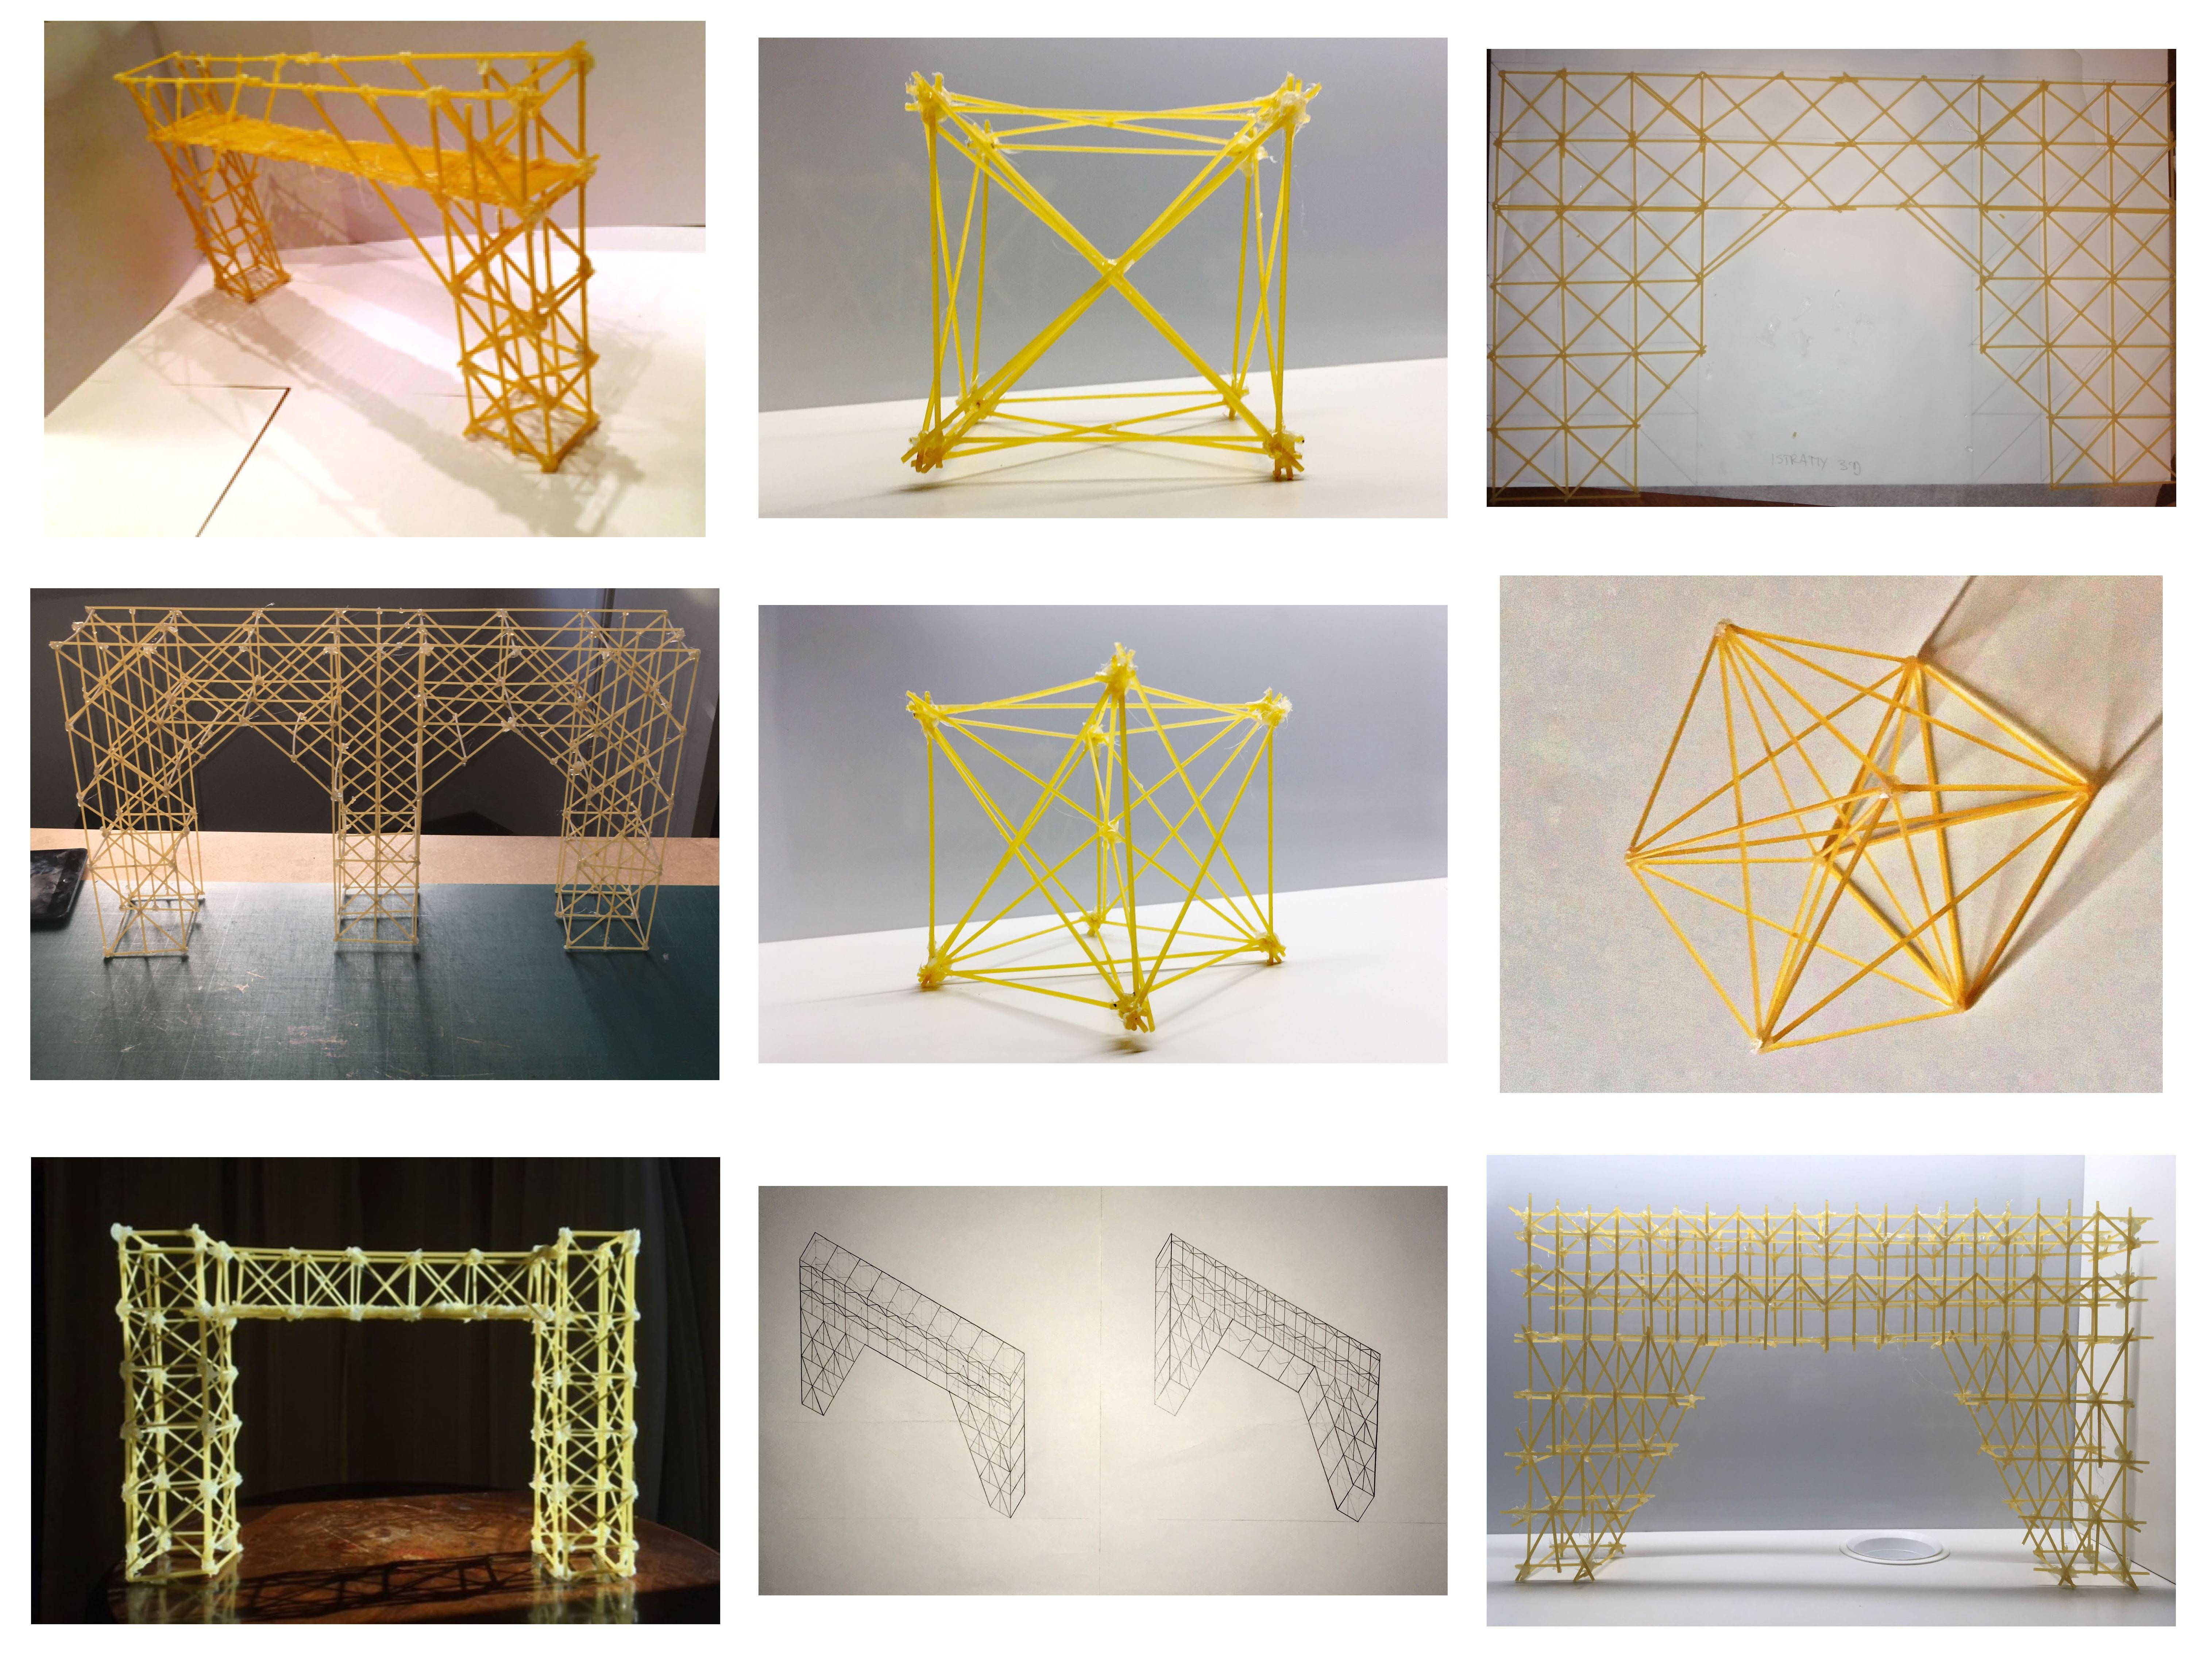 2020.11-3Dha-Gallery-liceo-DaD-3Dha-ponte-reticolare-e-cubo-3x3-HR_Page_06